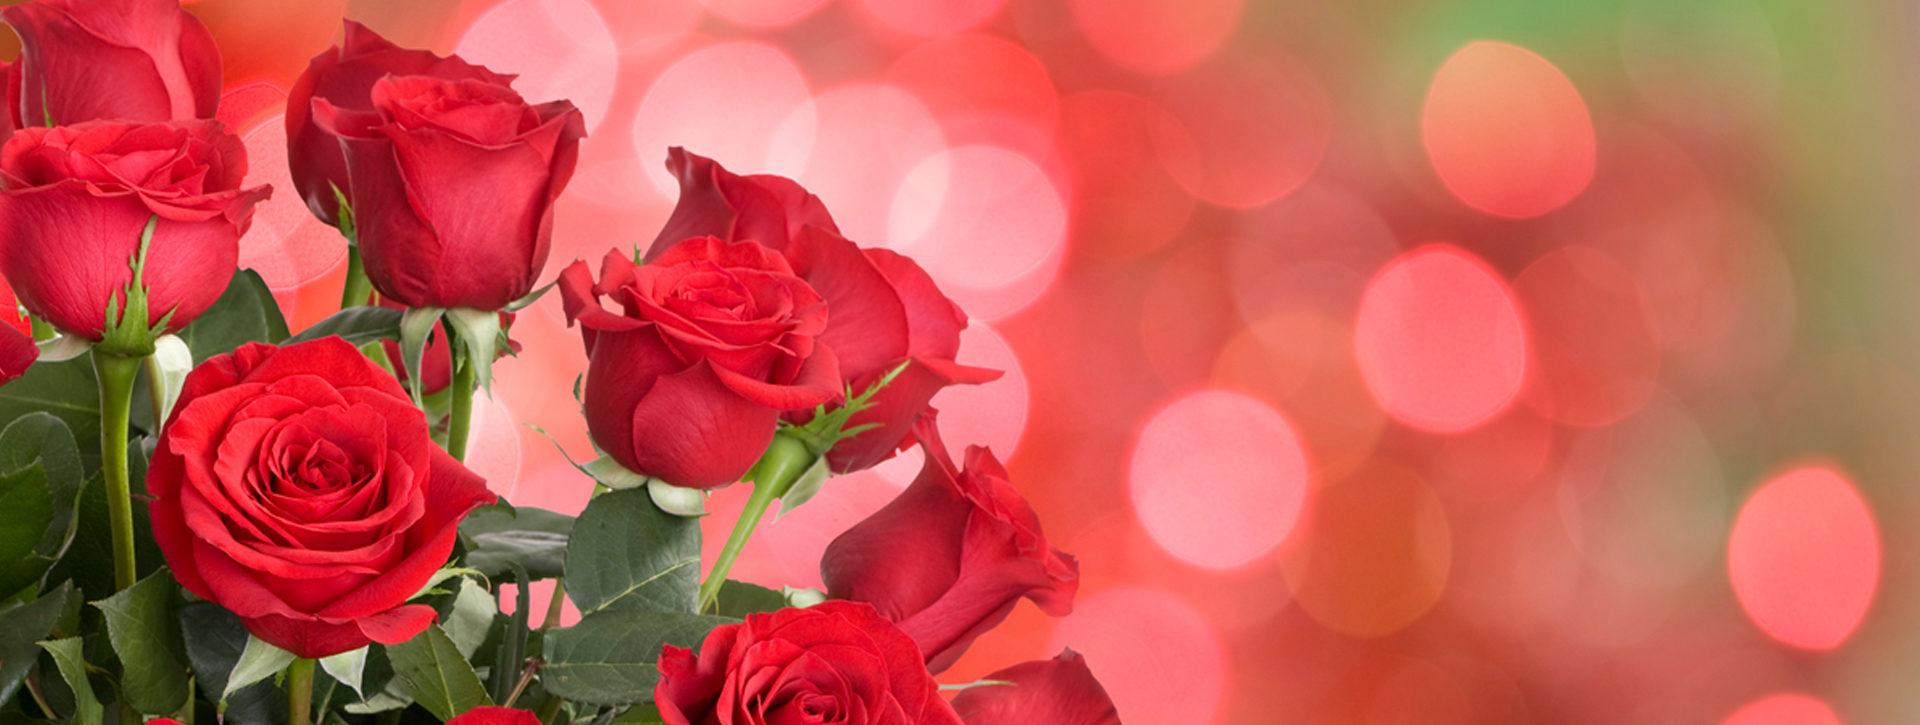 punaisia ruusuja